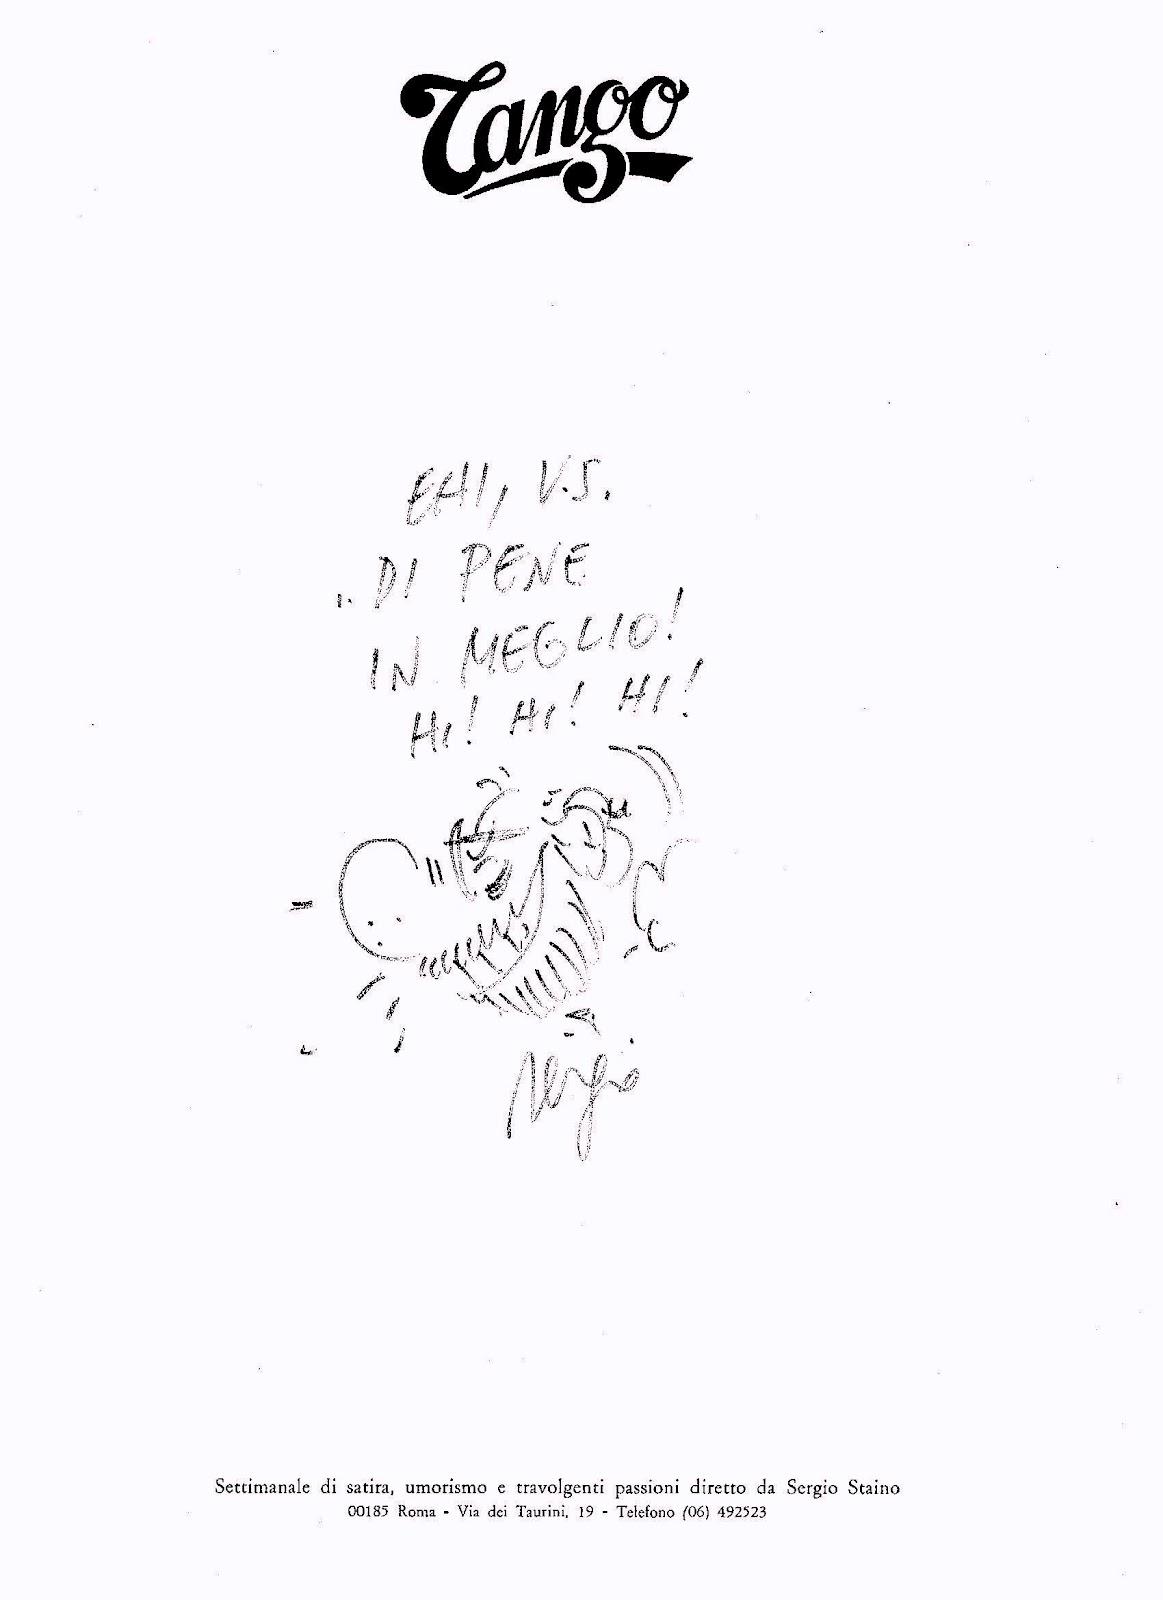 Ehi, V.S. di pene in meglio! ▲